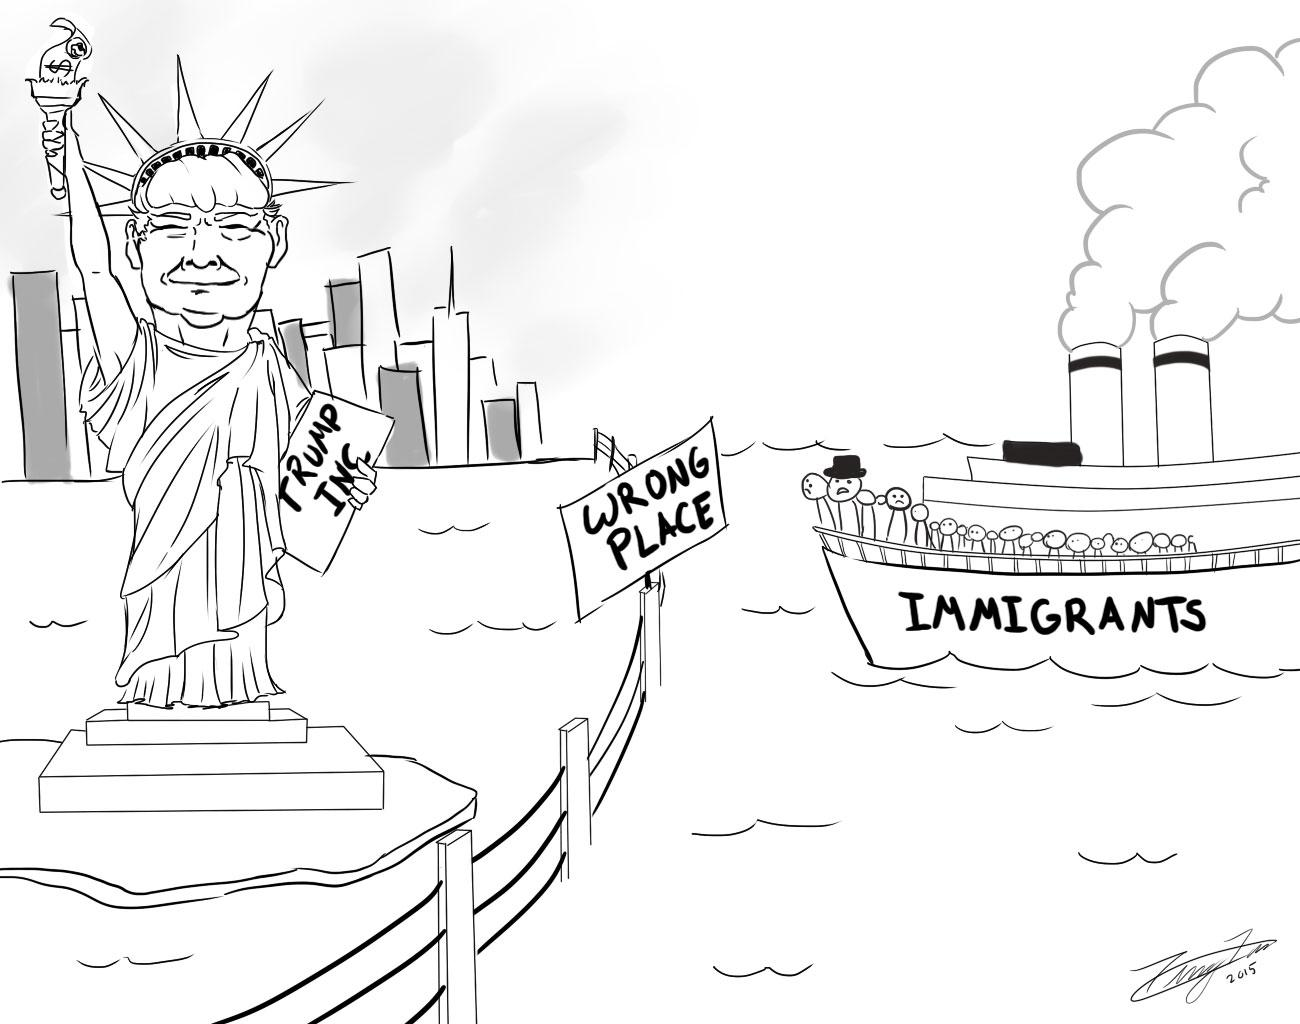 Terry Tan / Staff Illustrator